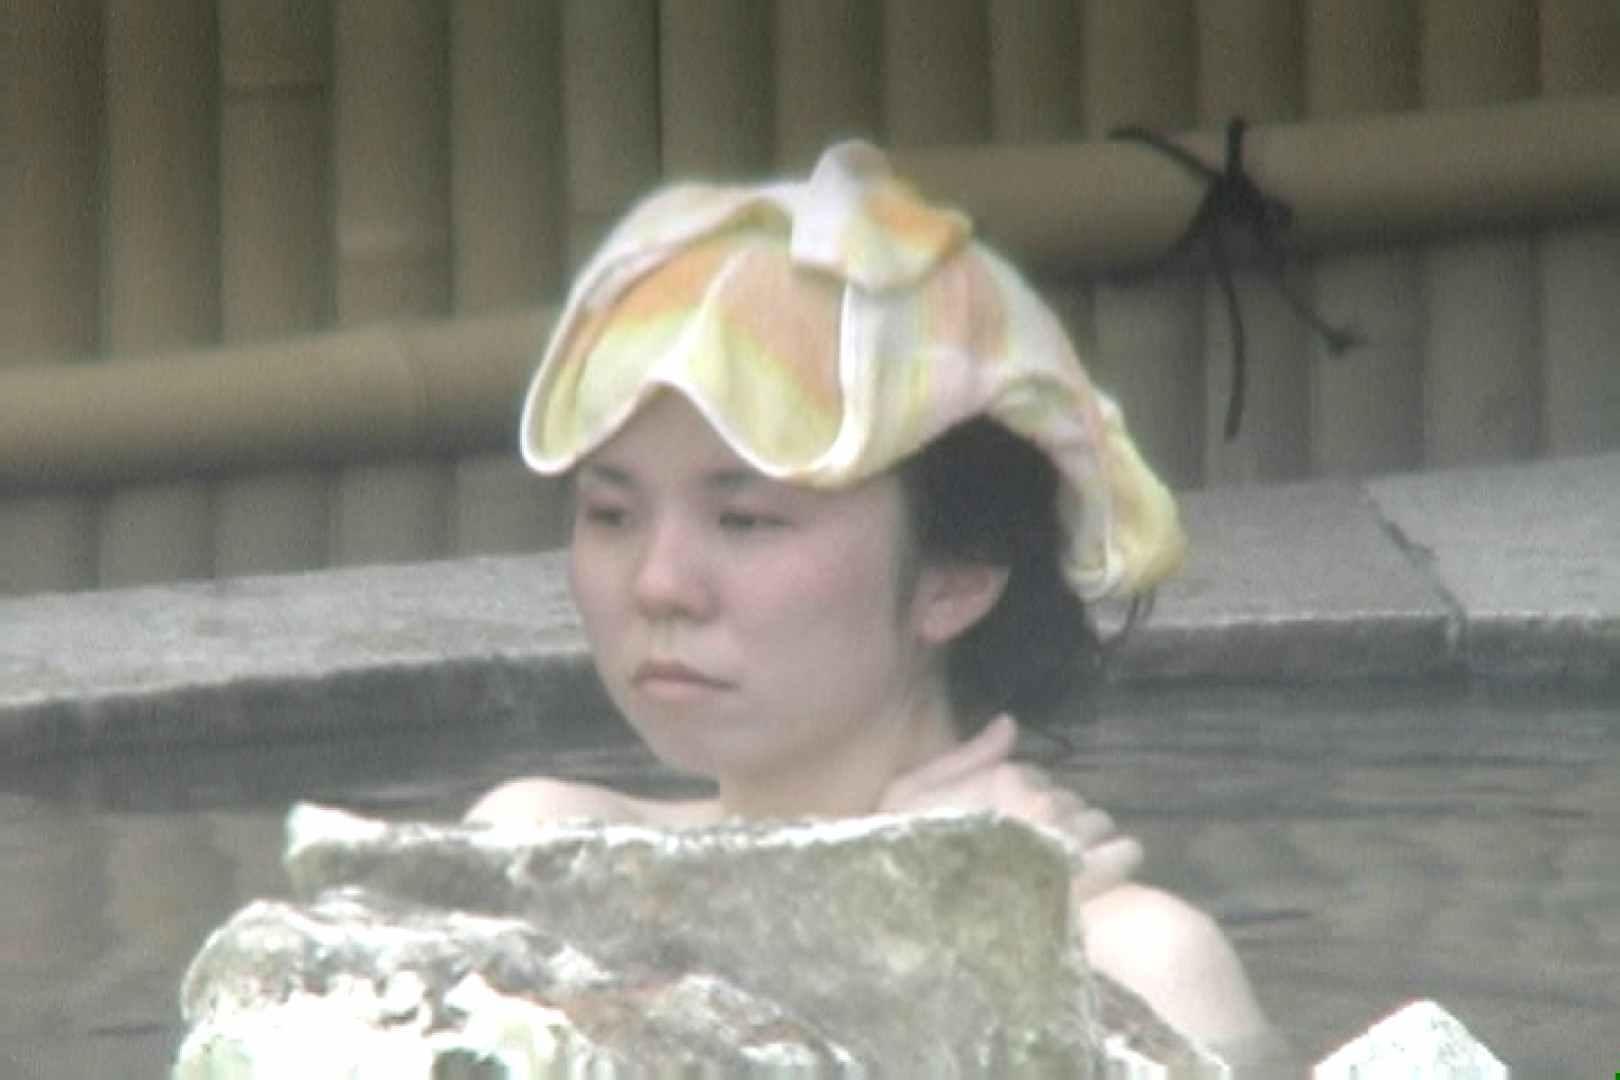 Aquaな露天風呂Vol.687 盗撮シリーズ | 露天風呂編  93PIX 69